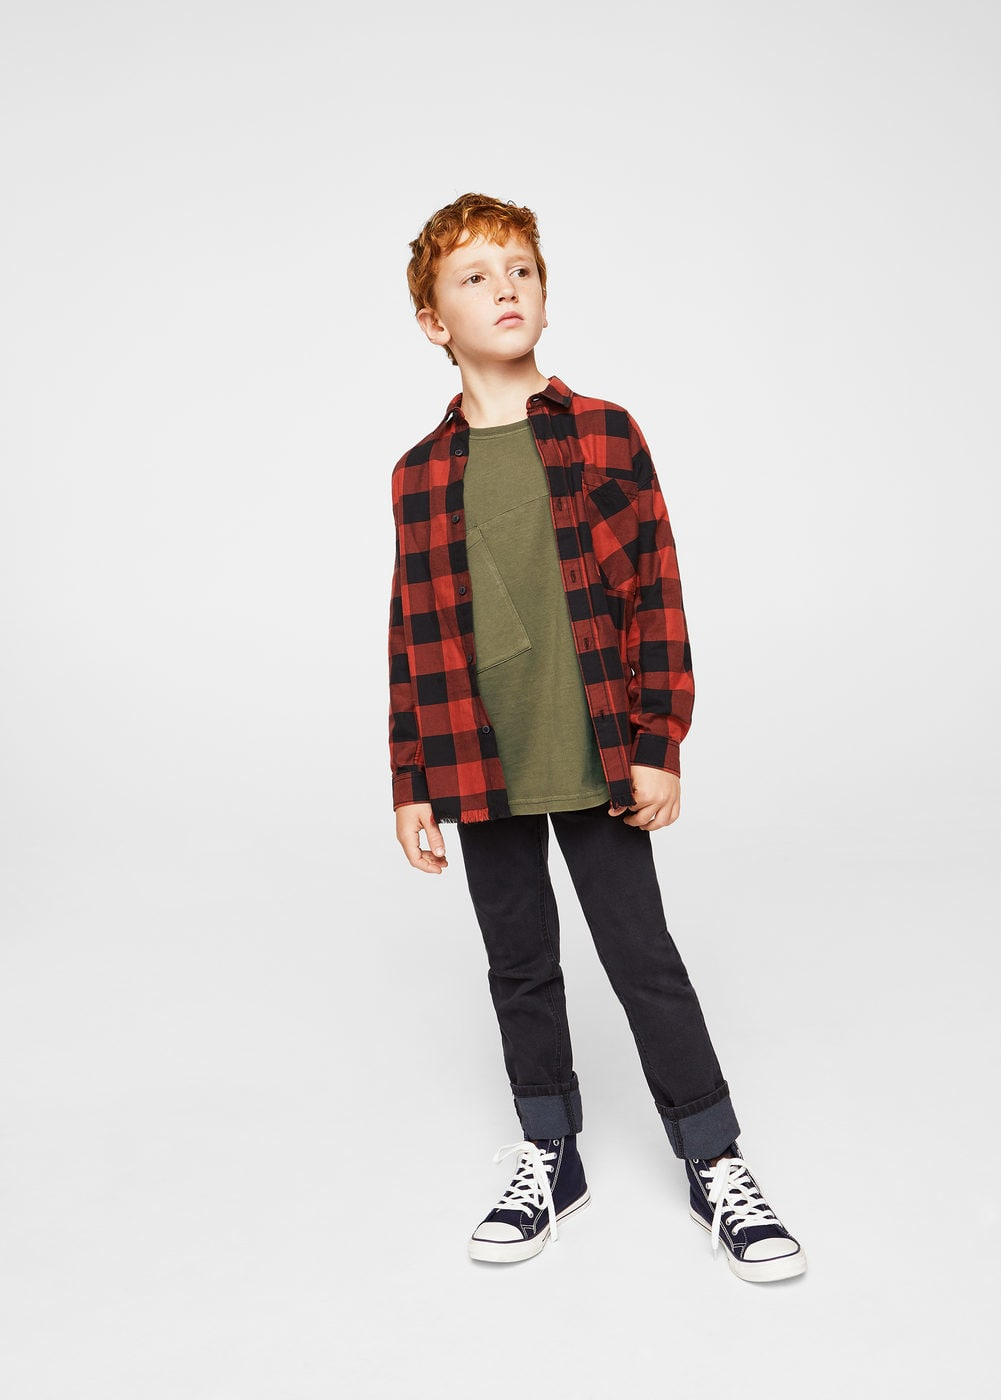 thời trang trẻ em nam